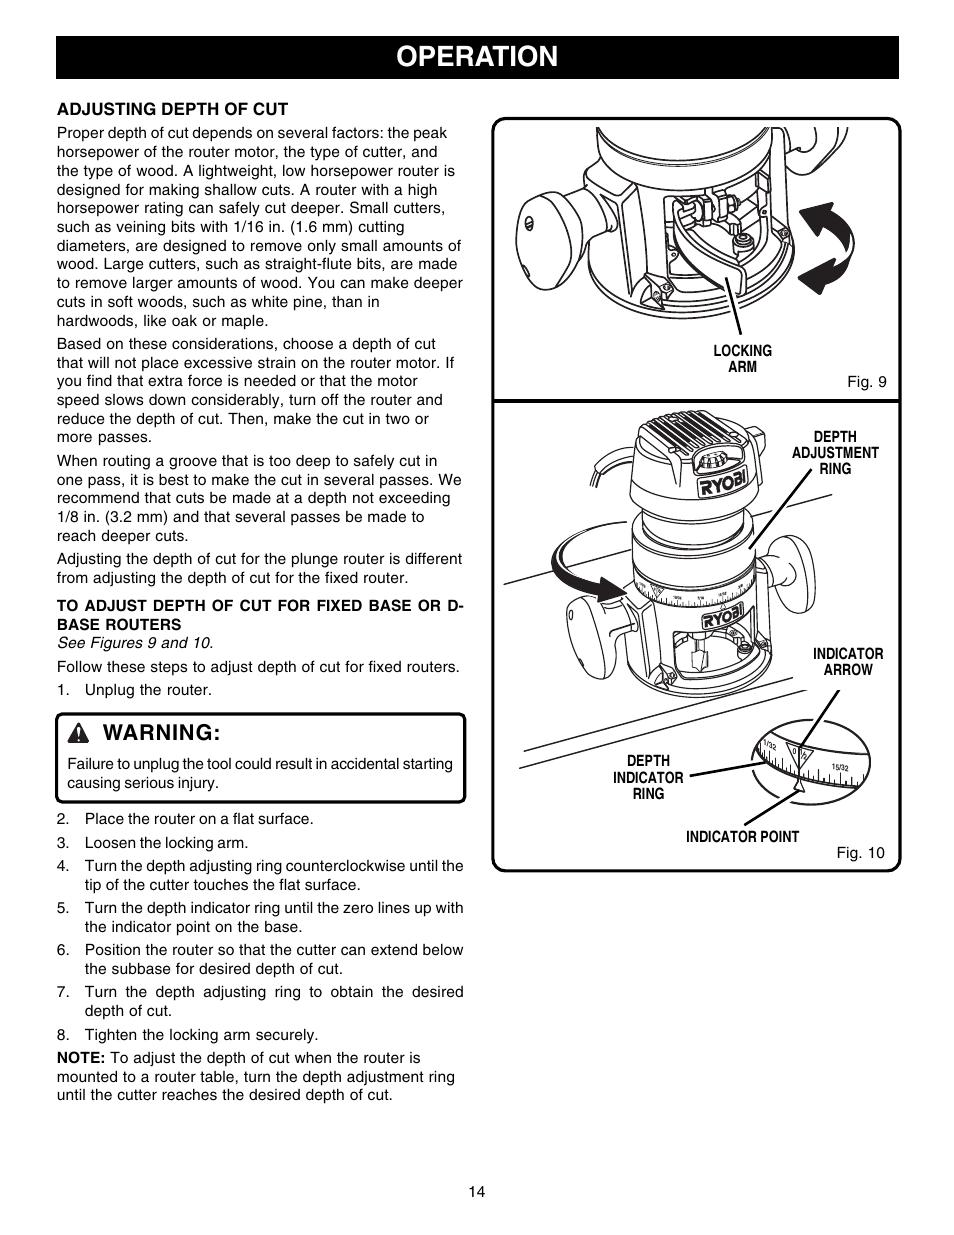 Operation Warning Ryobi R181fb1 User Manual Page 14 24 border=